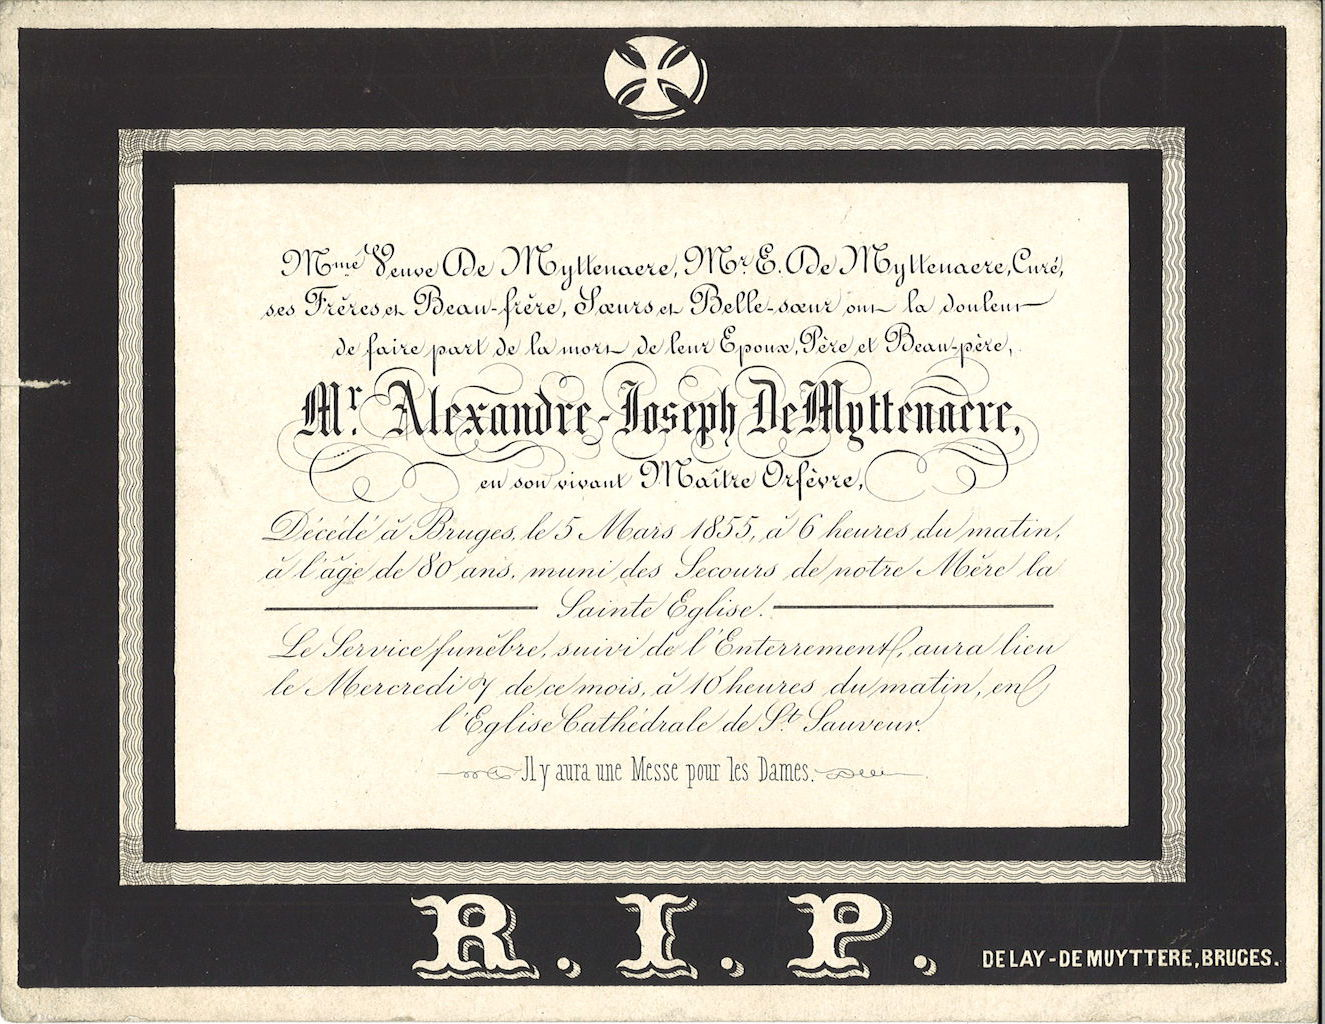 Alexandre-Joseph De Myttenaere